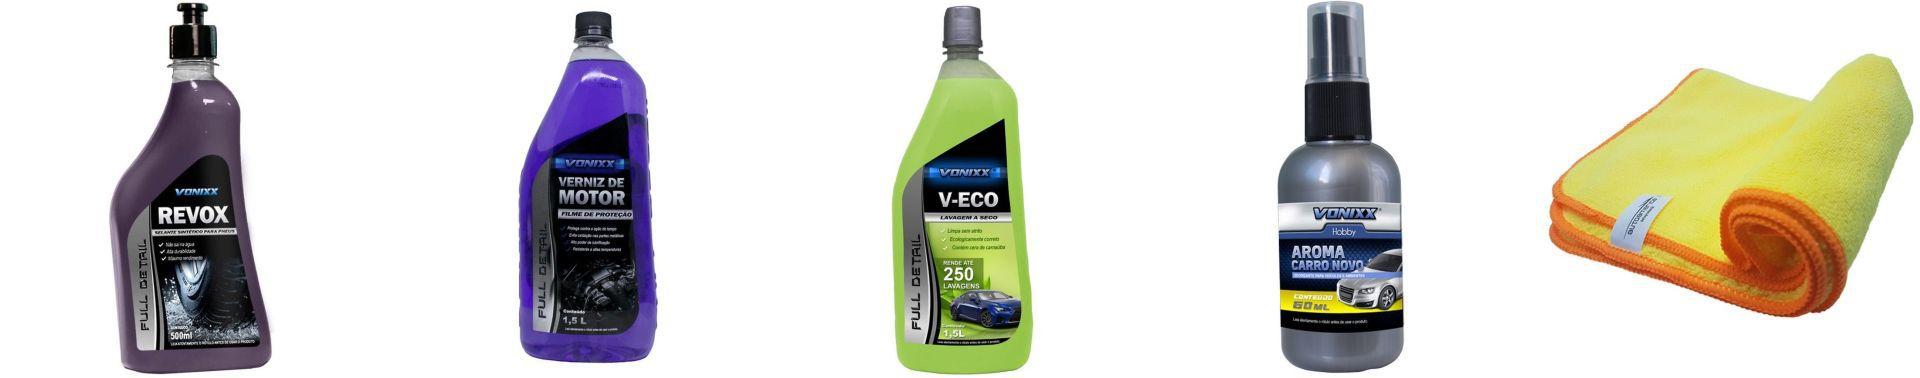 Kit Flanela +Aromatizante Spray Carro Novo+ V-Eco+Verniz de Motor+ Revox